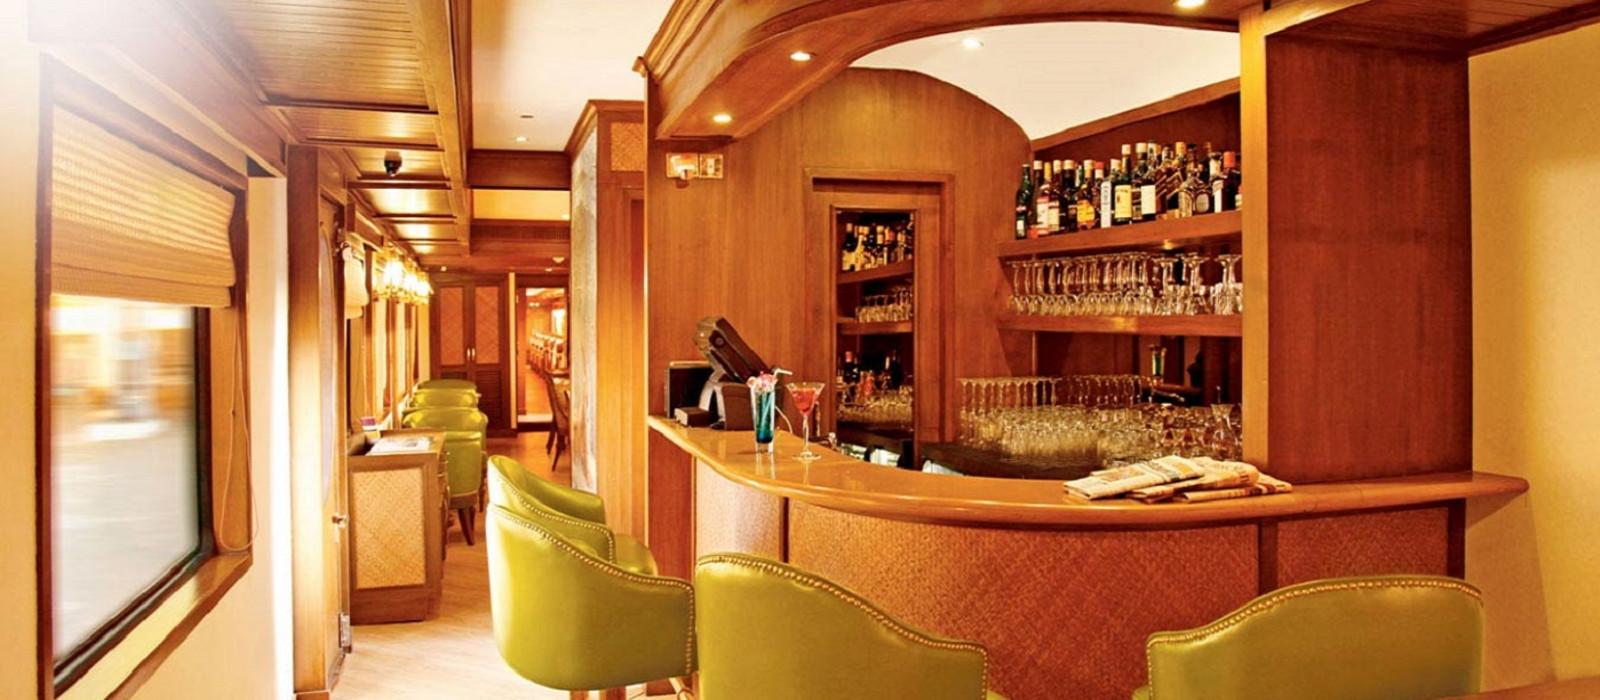 Hotel Maharajas Express –  Gems of India (3 nights) Nordindien